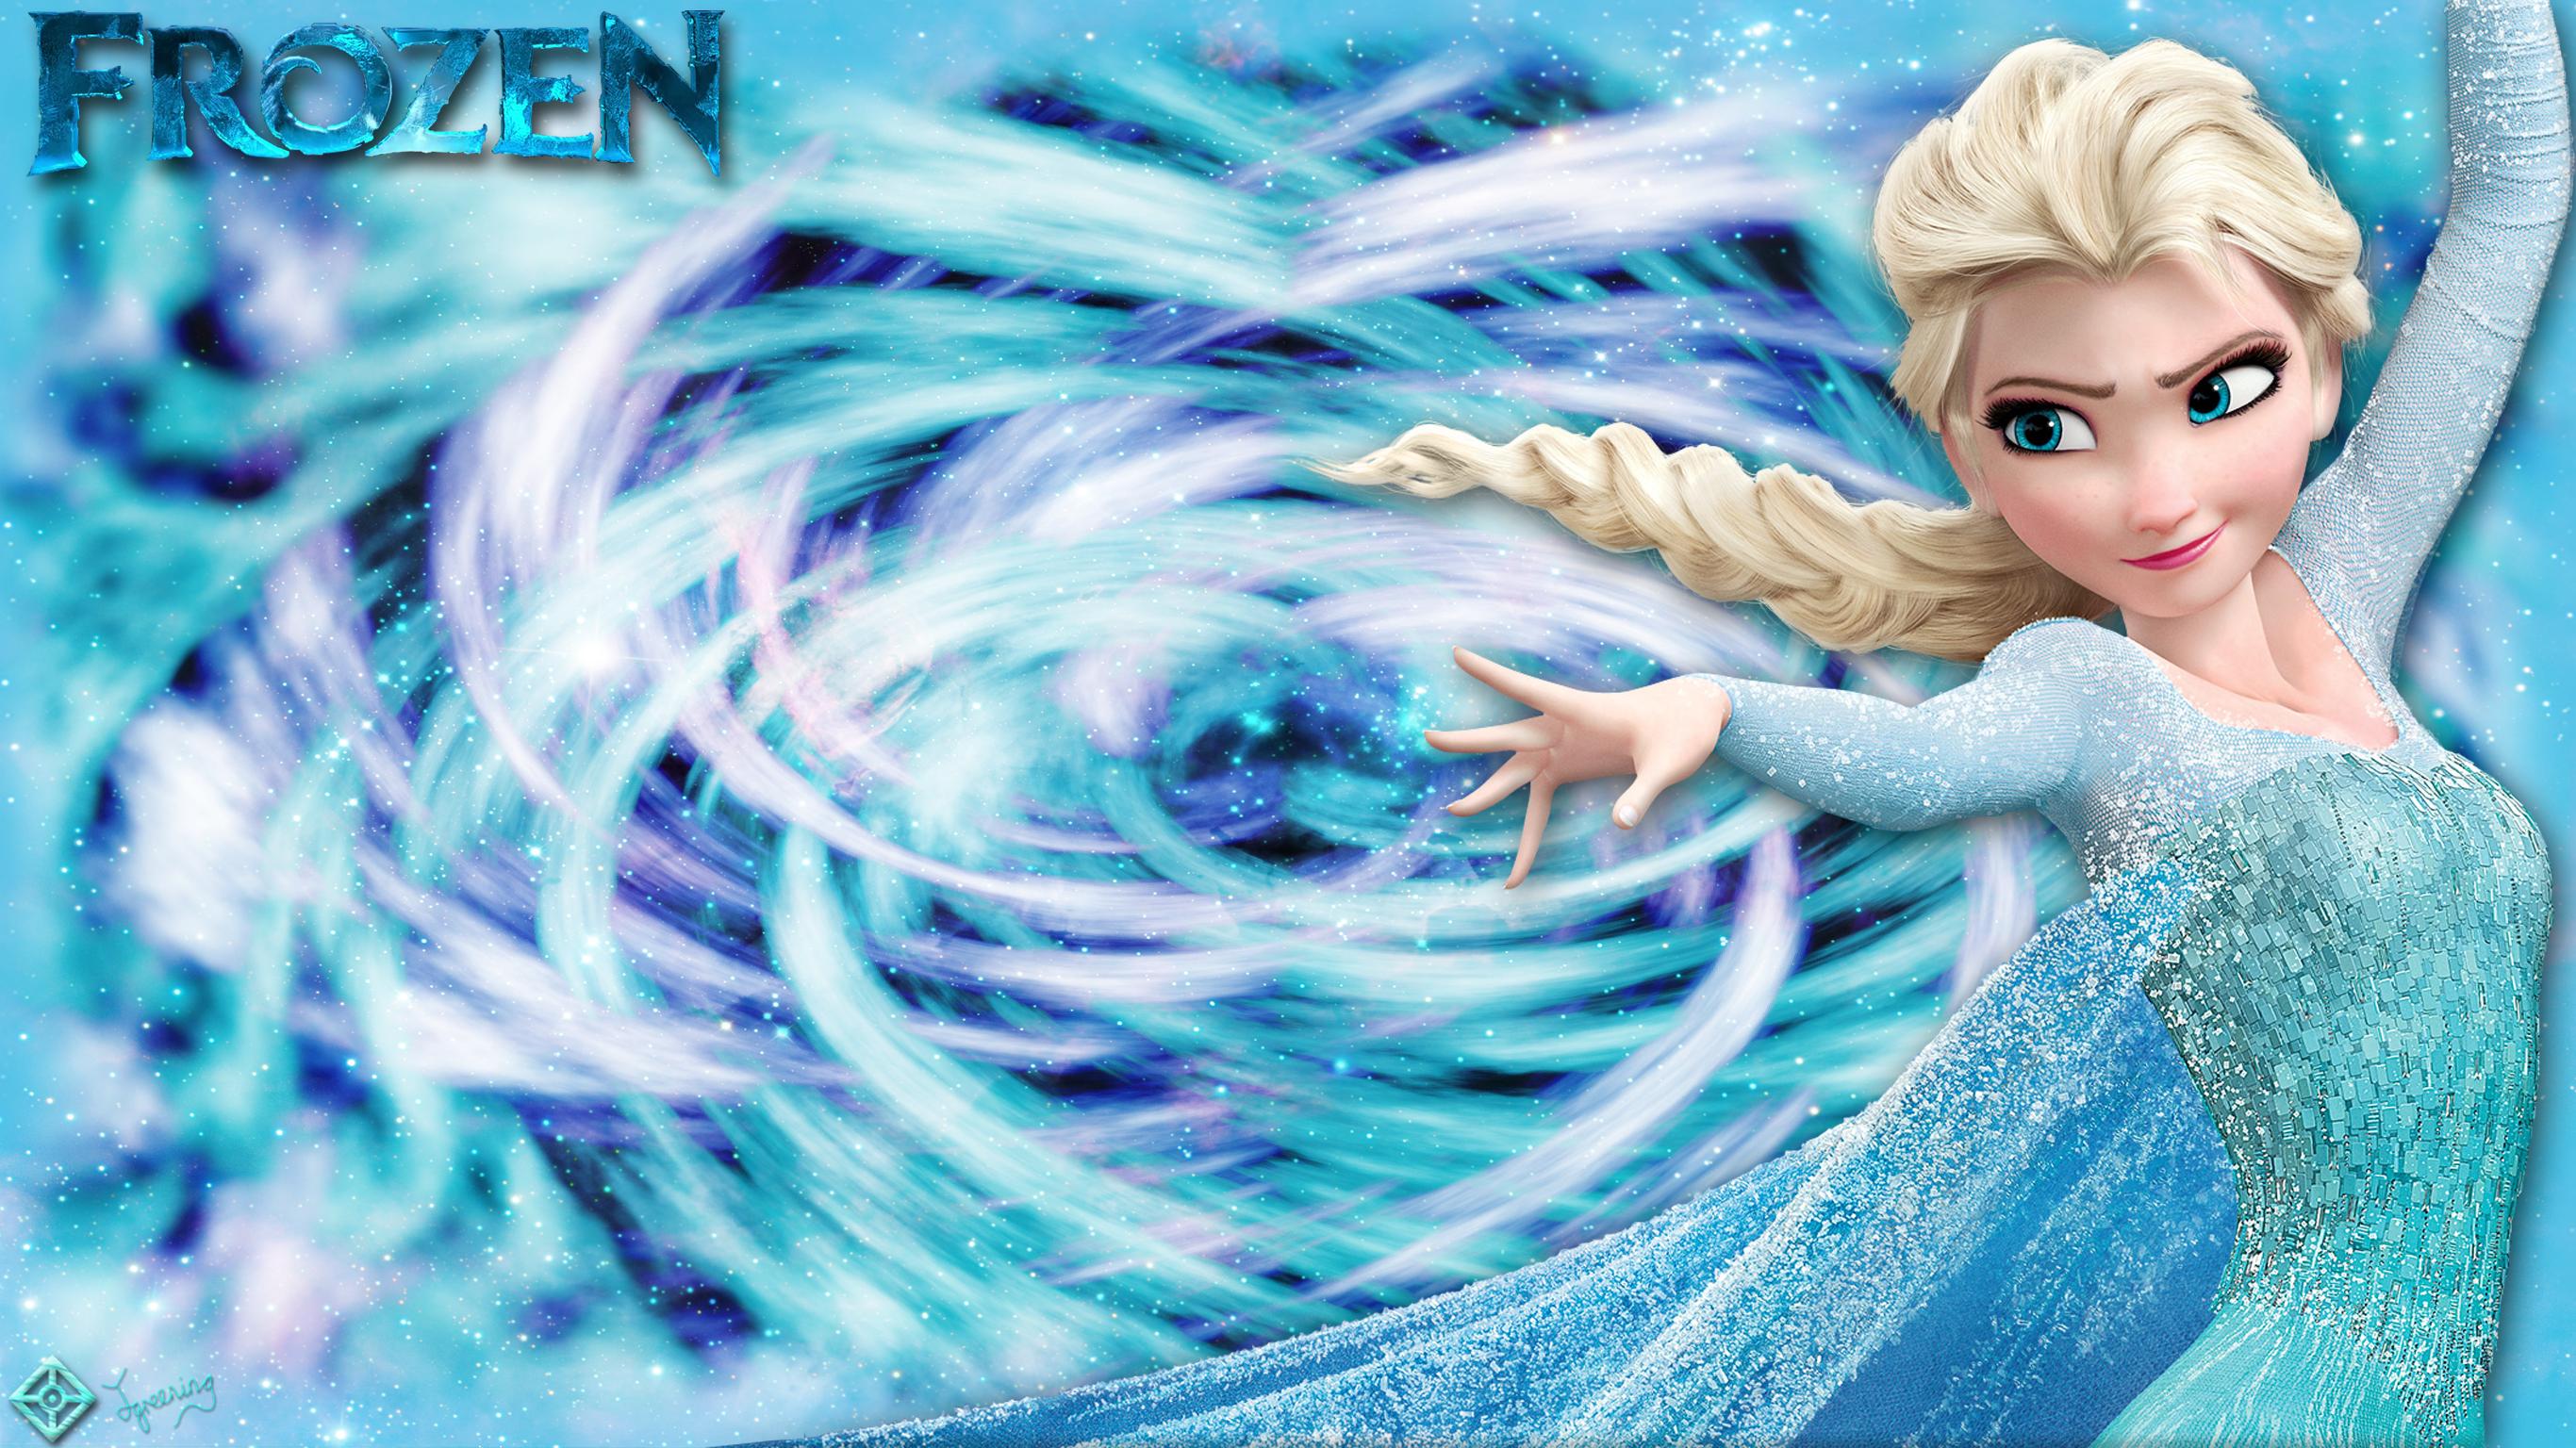 elsa frozen wallpapers hd | wallpapers, backgrounds, images, art